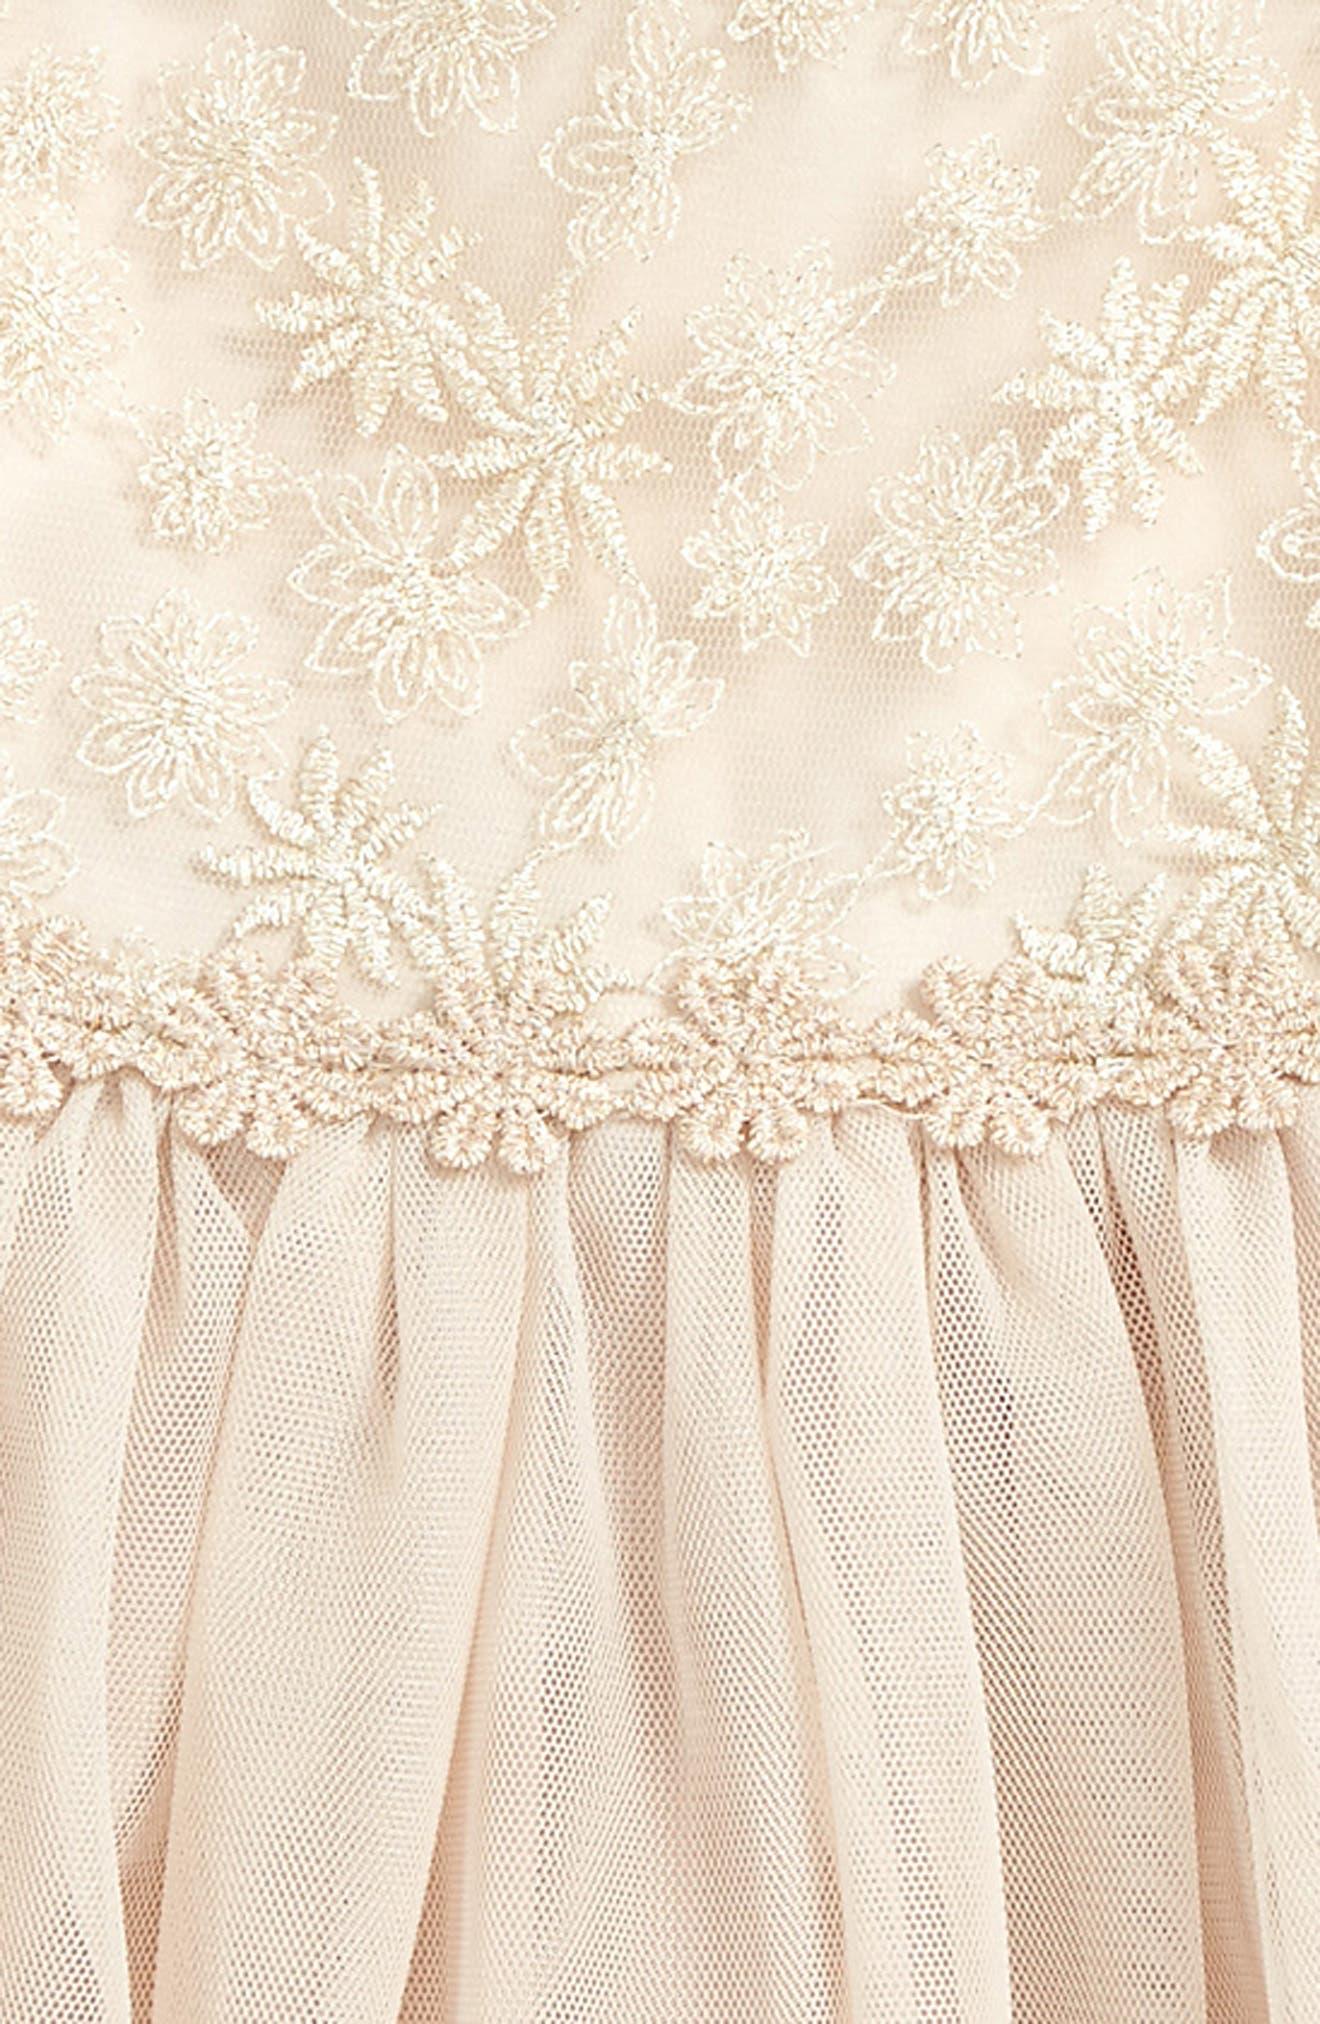 Lace & Tulle Dress,                             Alternate thumbnail 2, color,                             713